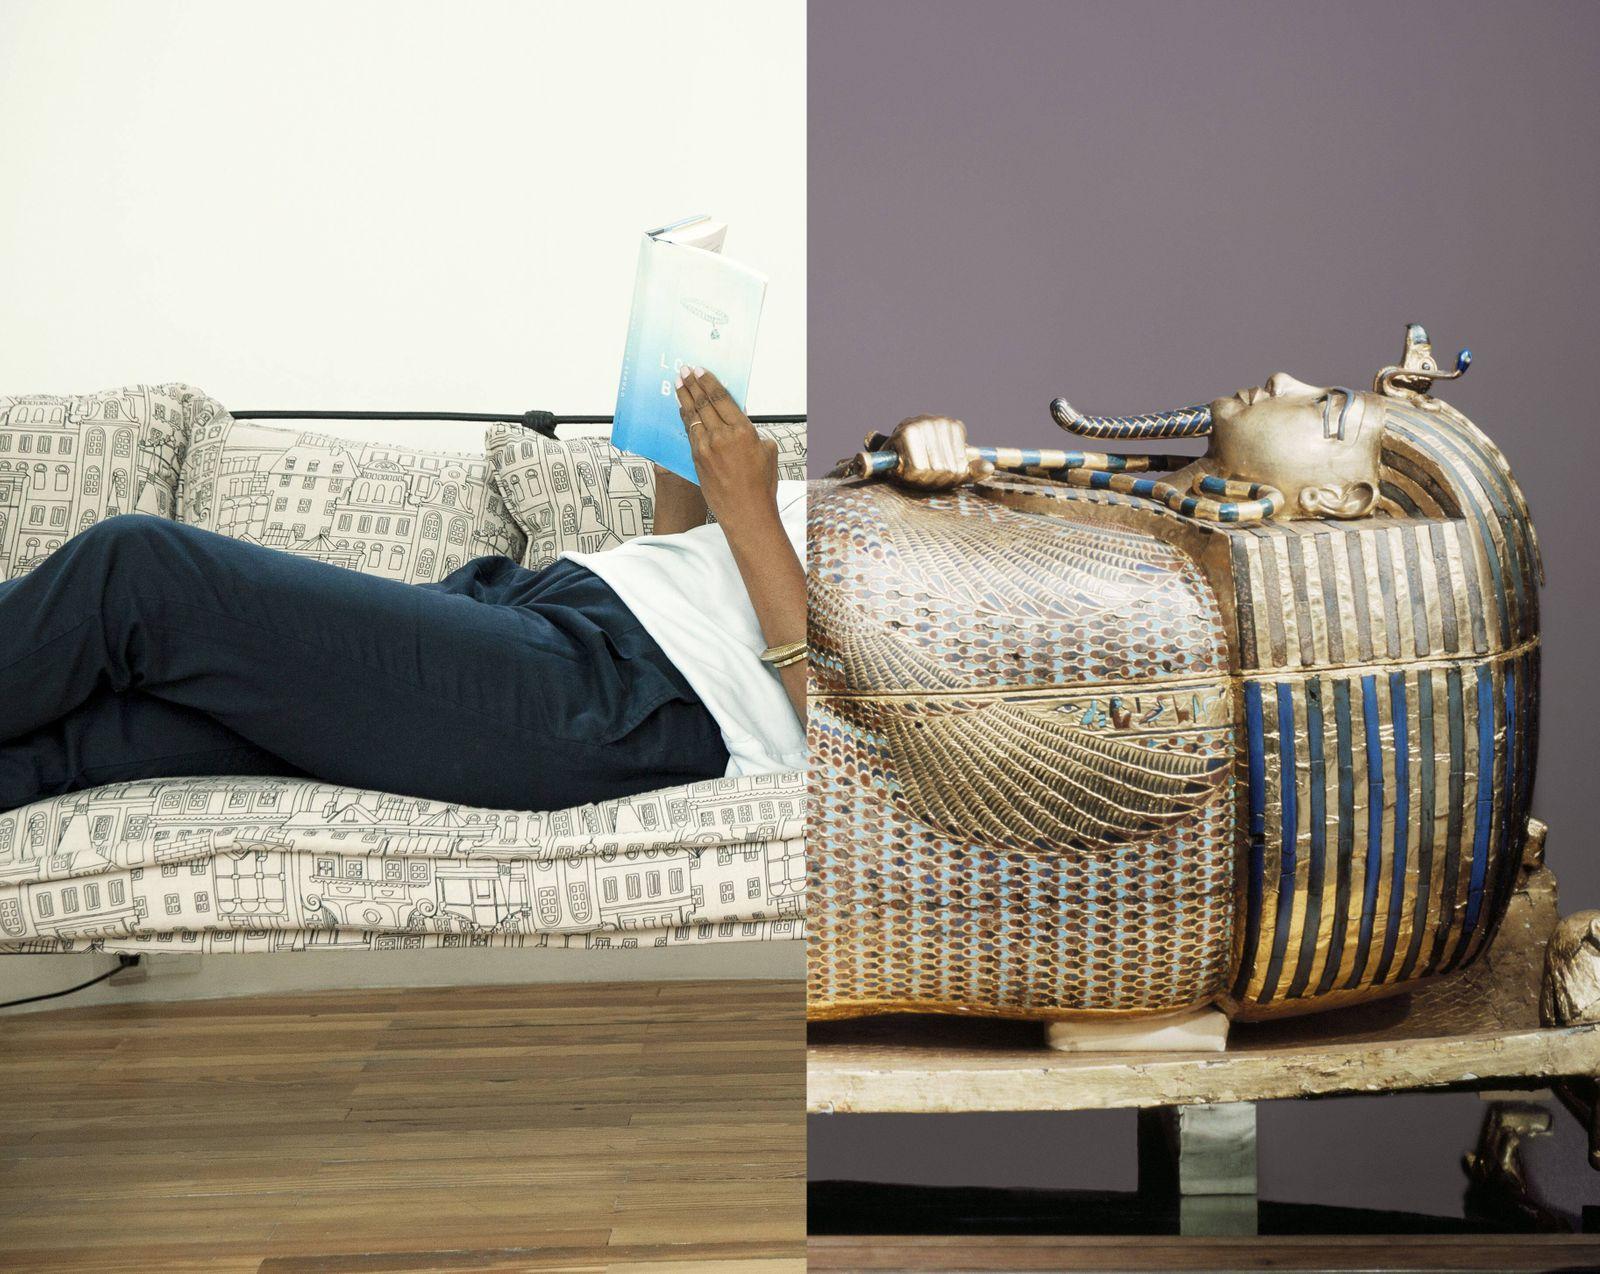 Woman relaxing at home with good book PUBLICATIONxINxGERxSUIxAUTxONLY Copyright SigridxOlsson B5579